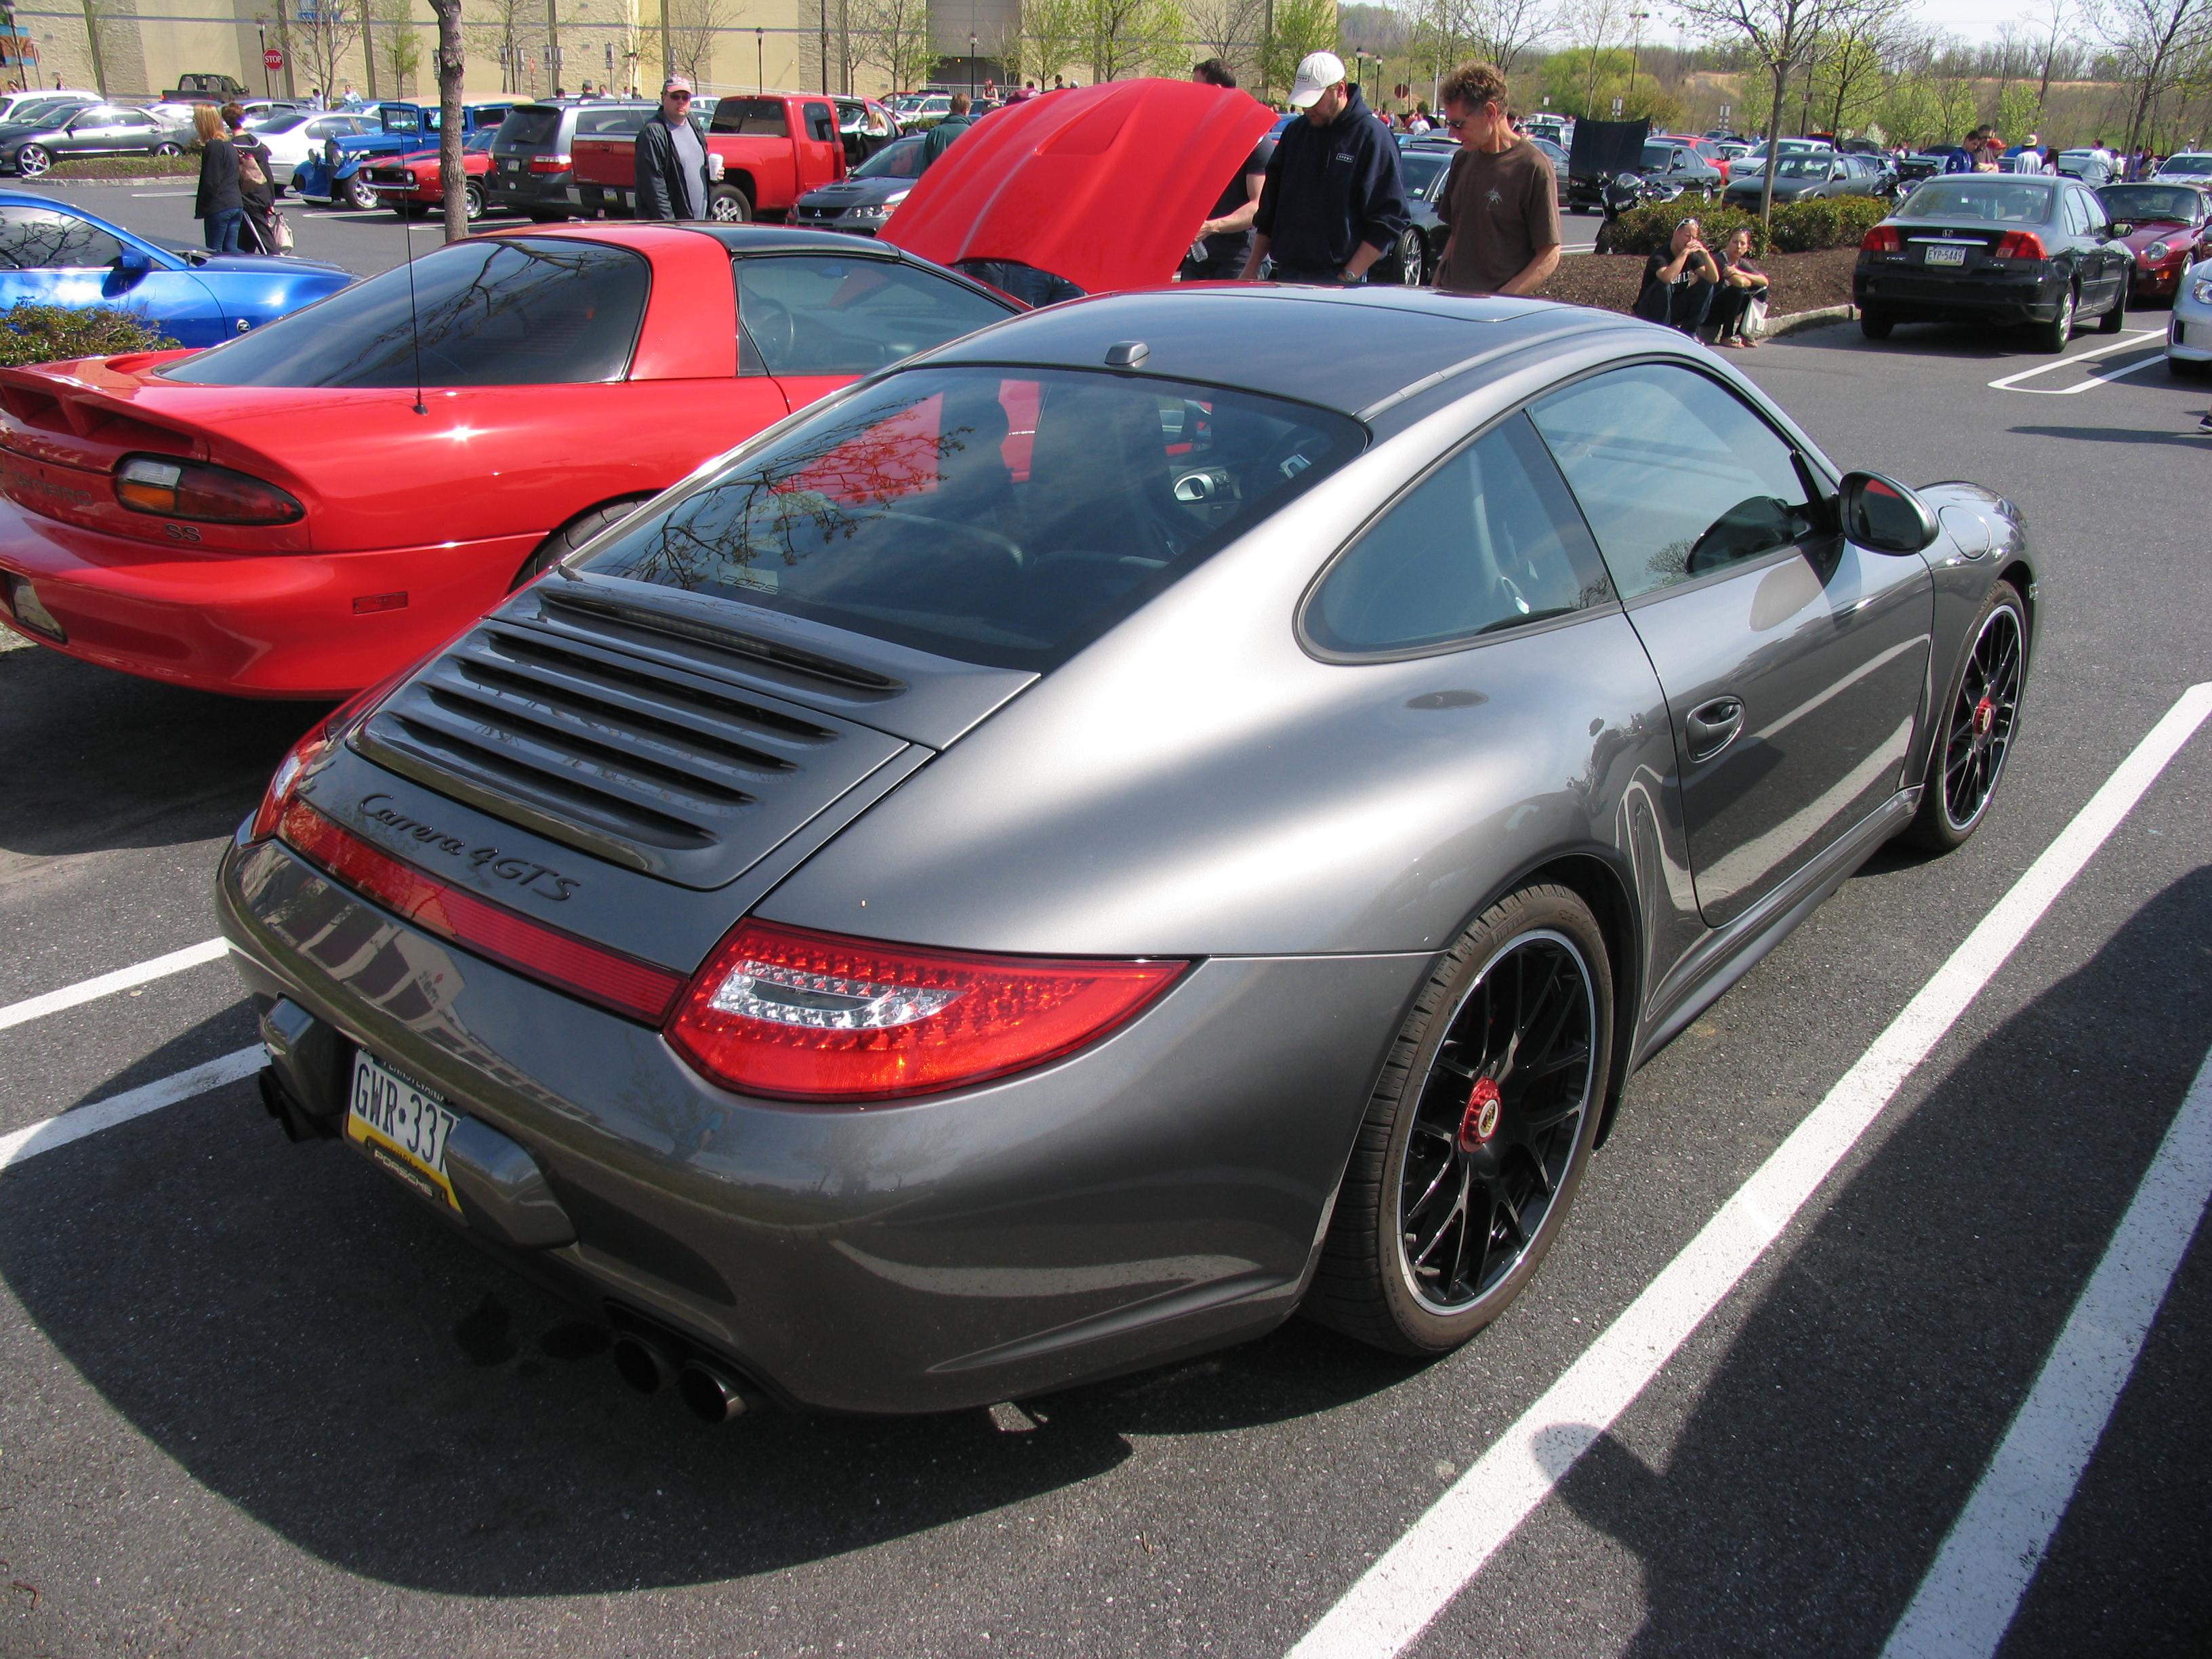 File Porsche 911 Carrera 4 Gts 997 8688847865 Jpg Wikimedia